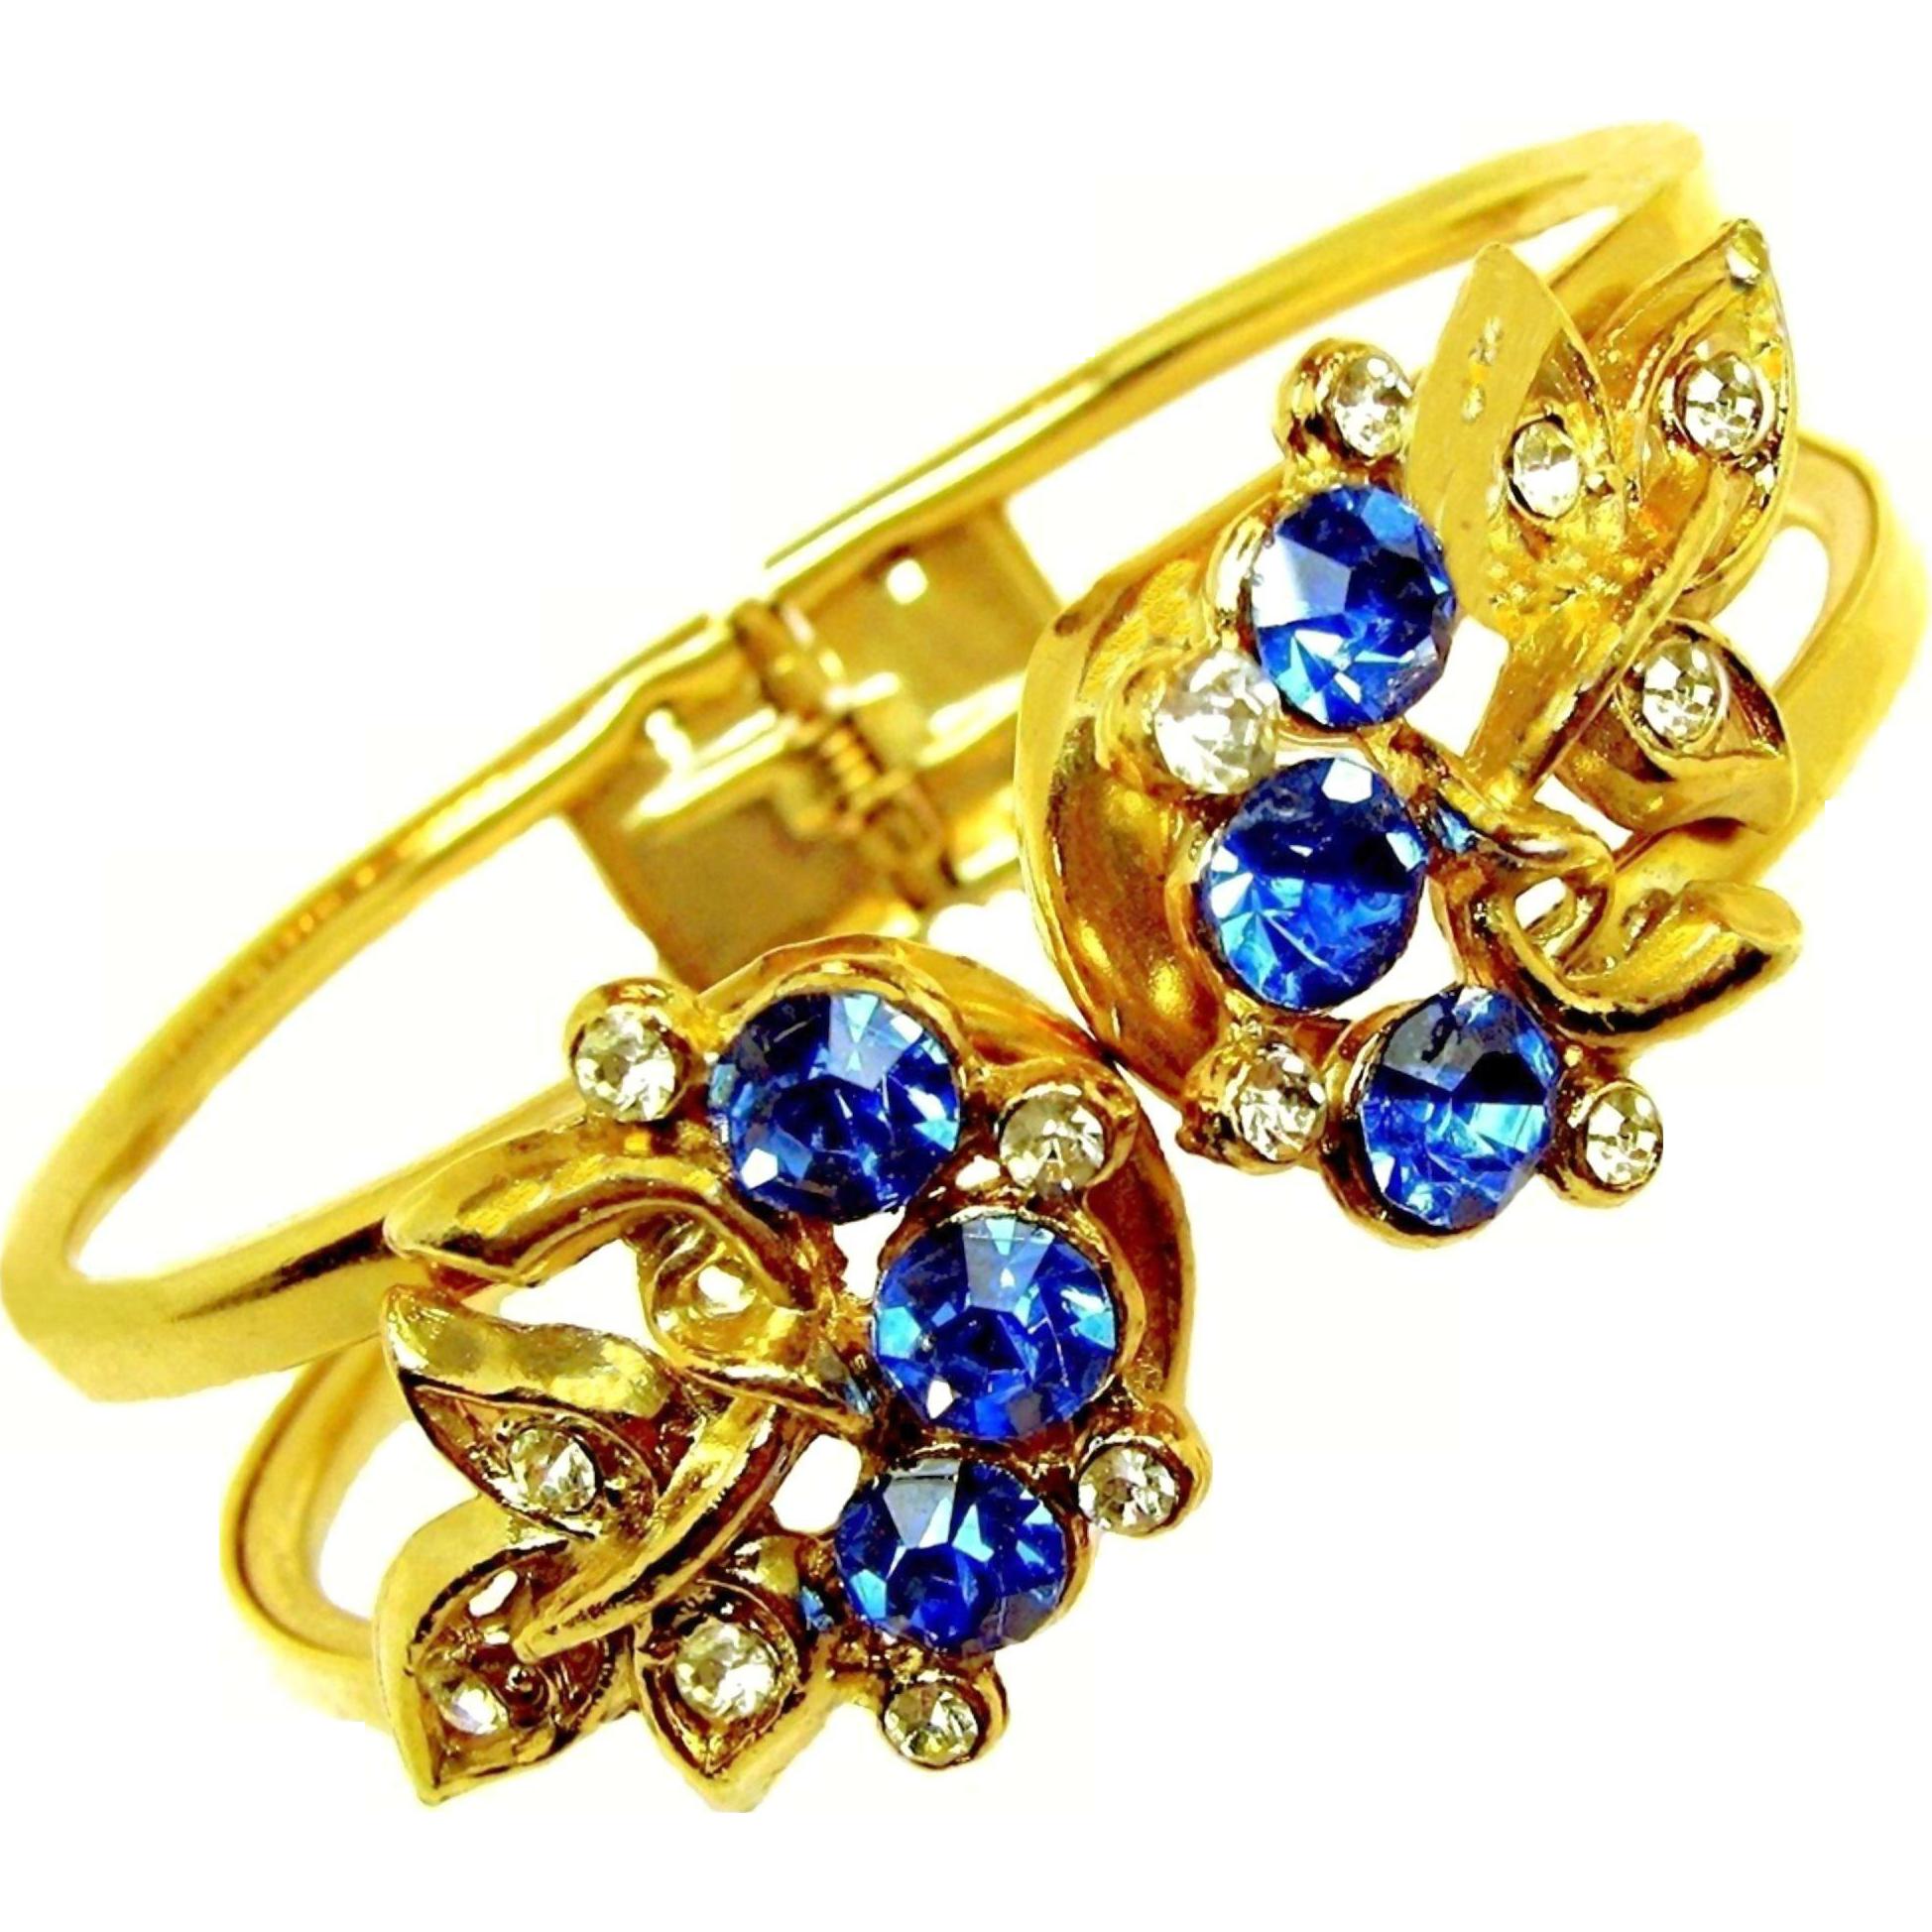 Vintage Rhinestone Mid-Century Floral Clamper Bracelet